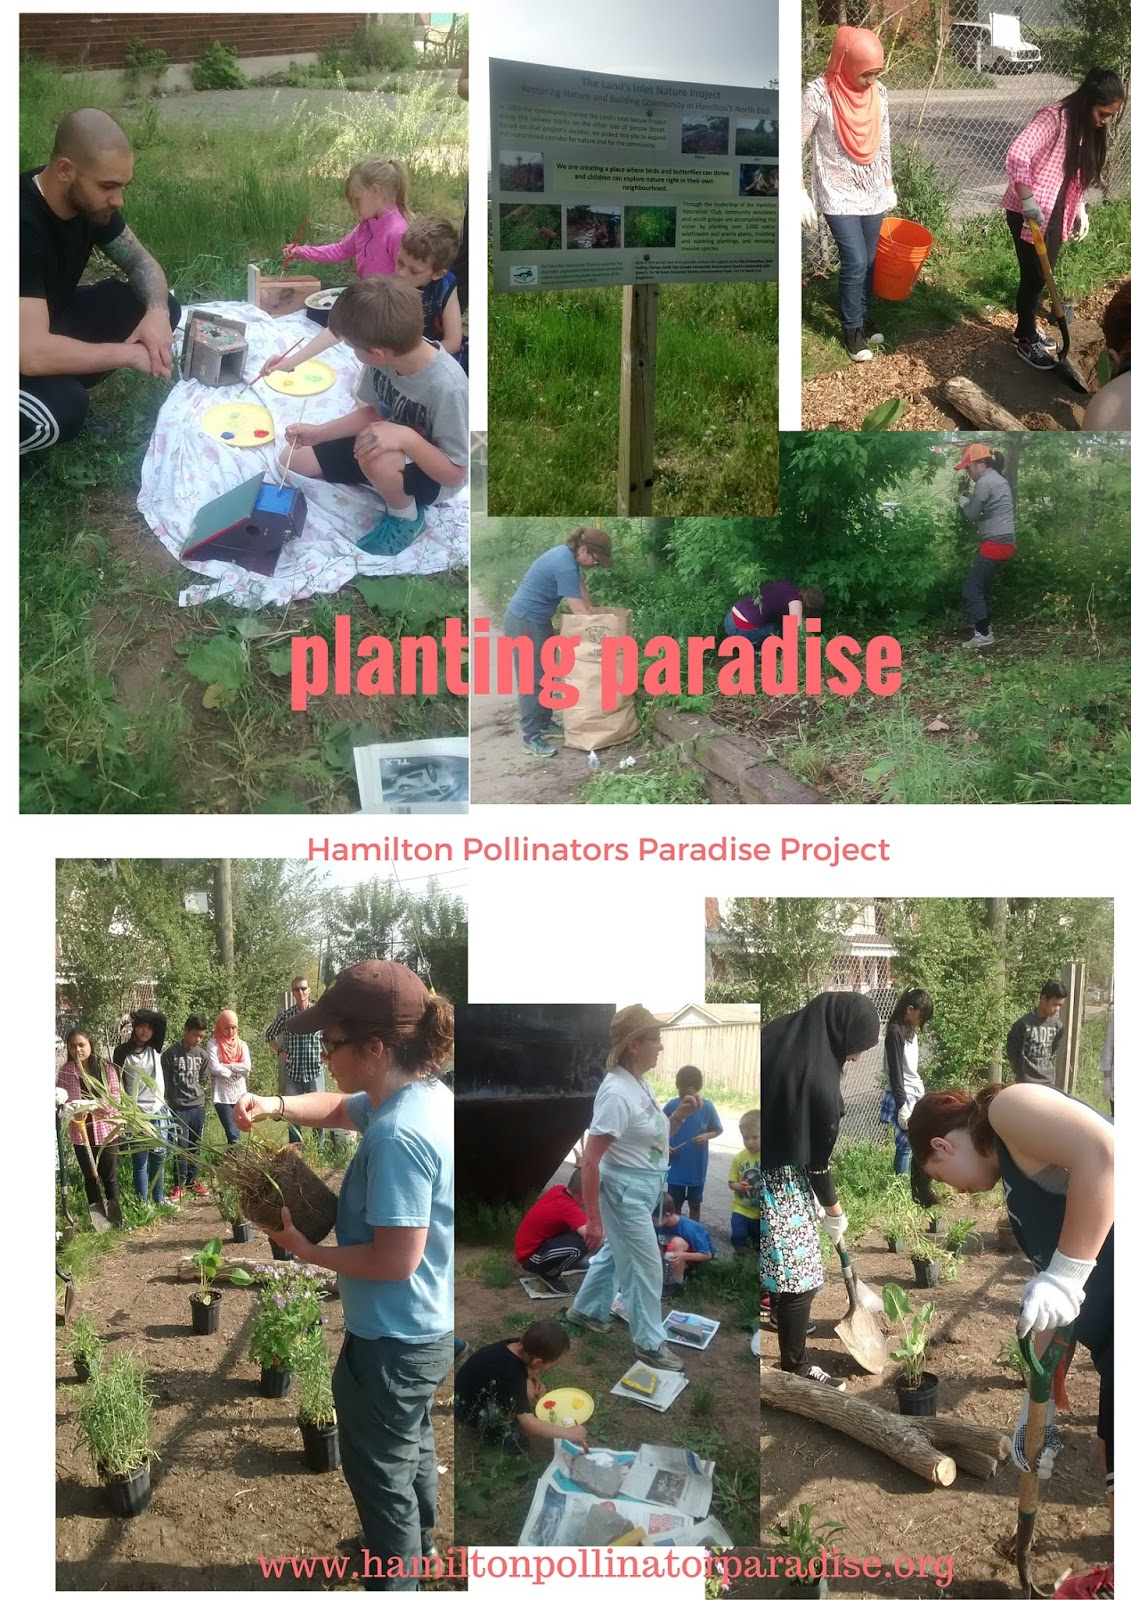 pollinators paradise project 2016